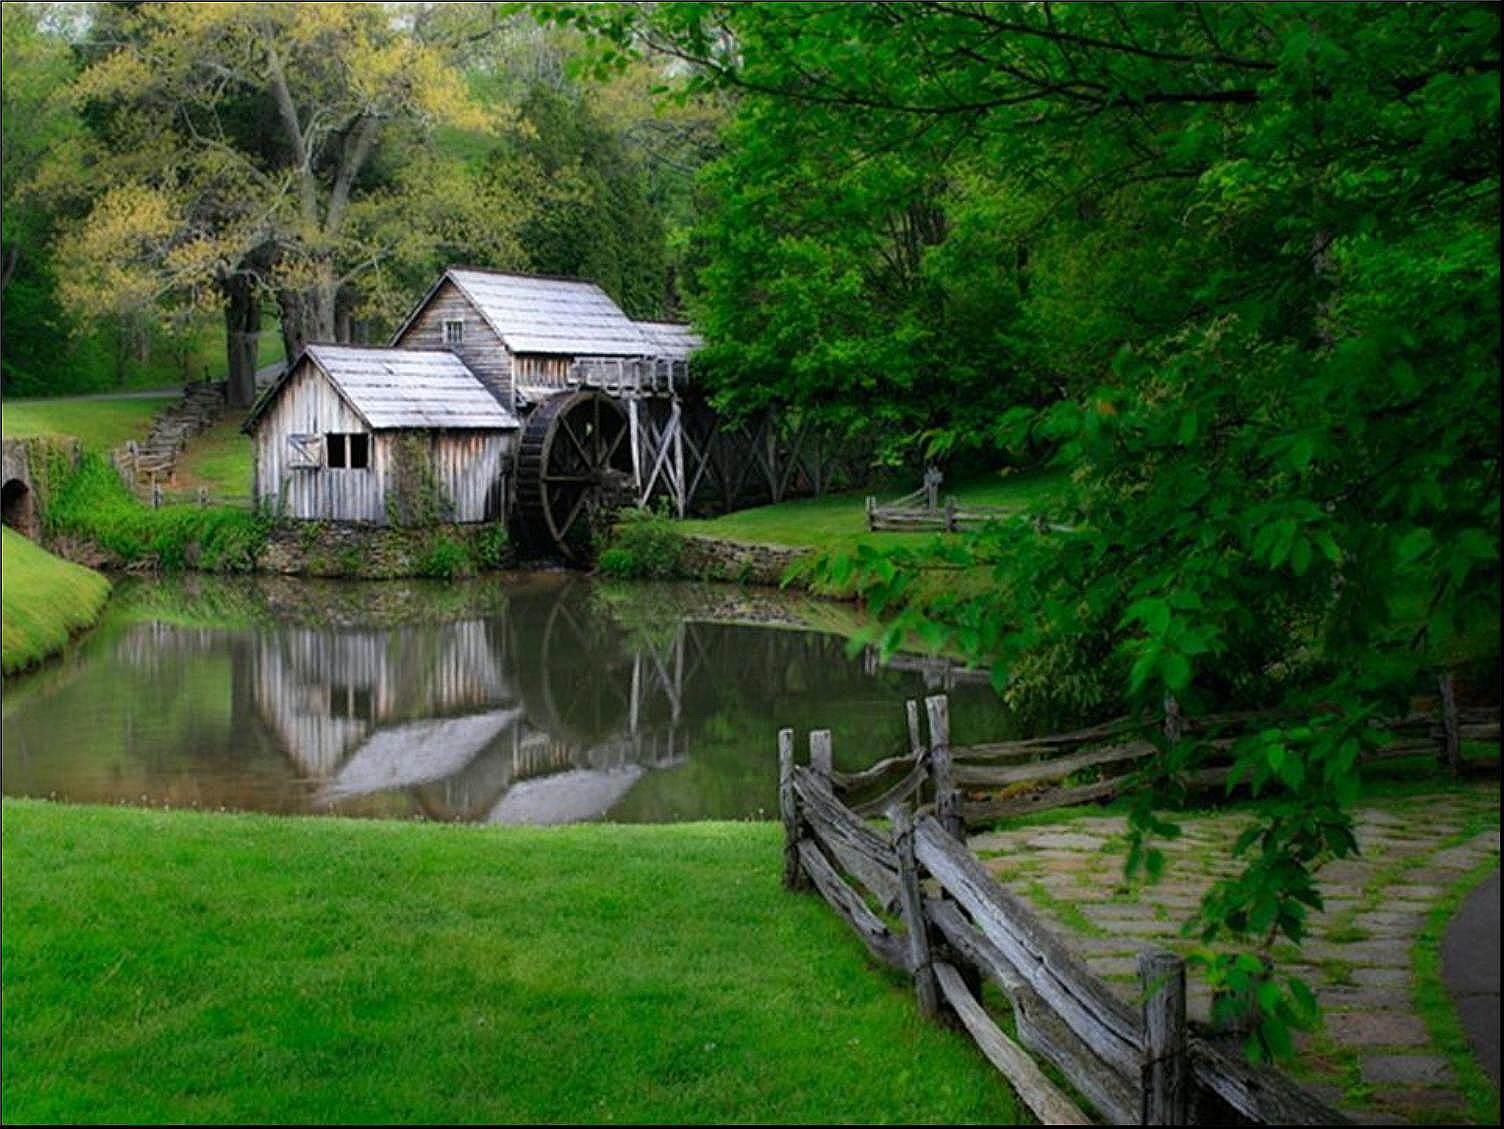 027 staré chalupy - farmy - mlýny